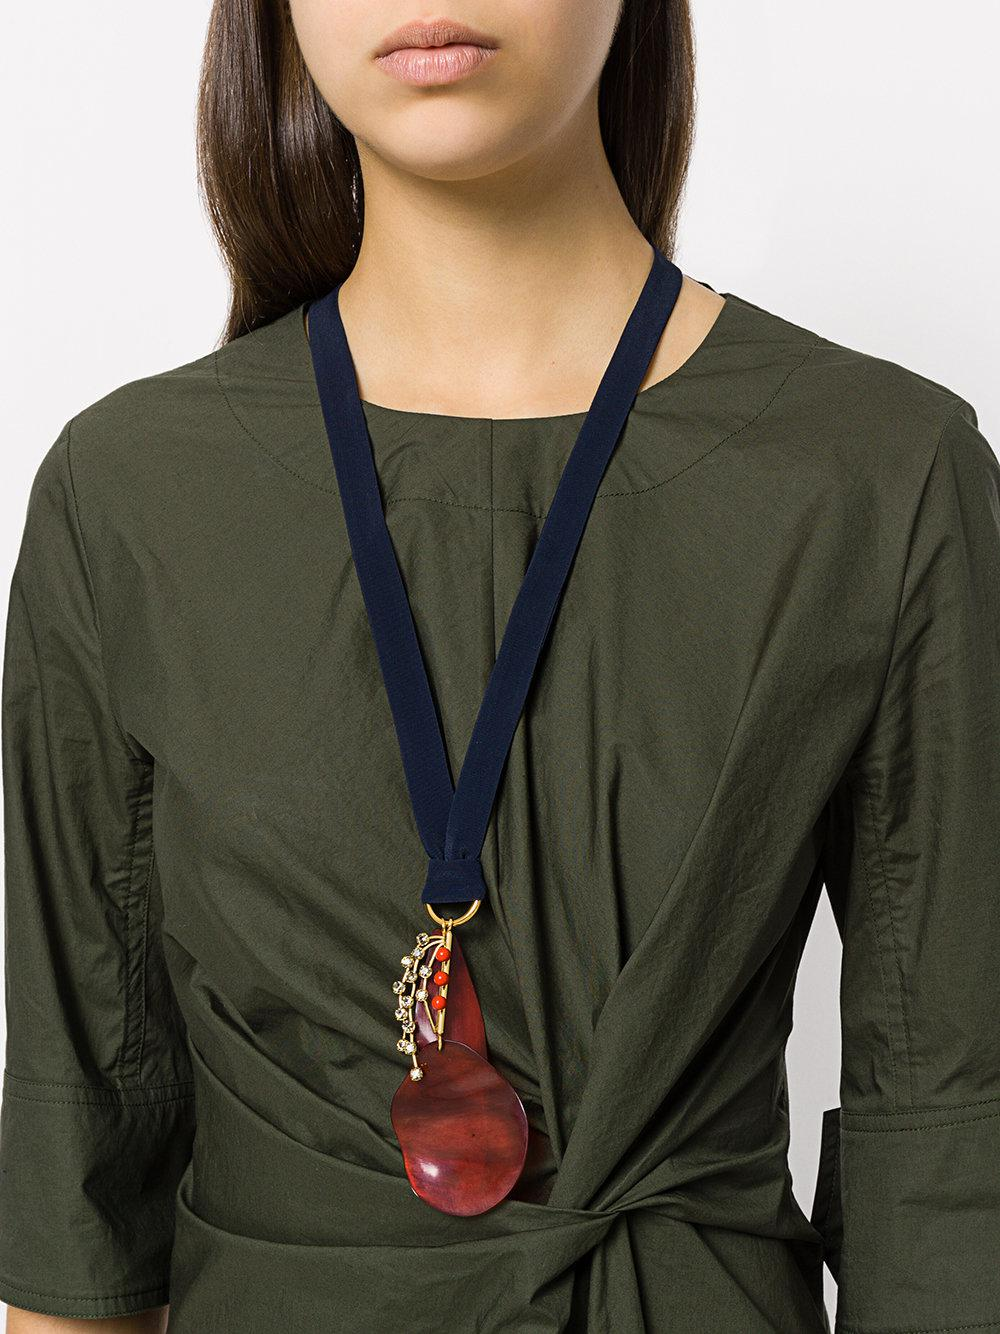 Marni Silk Ribbon Pendant Necklace in Red